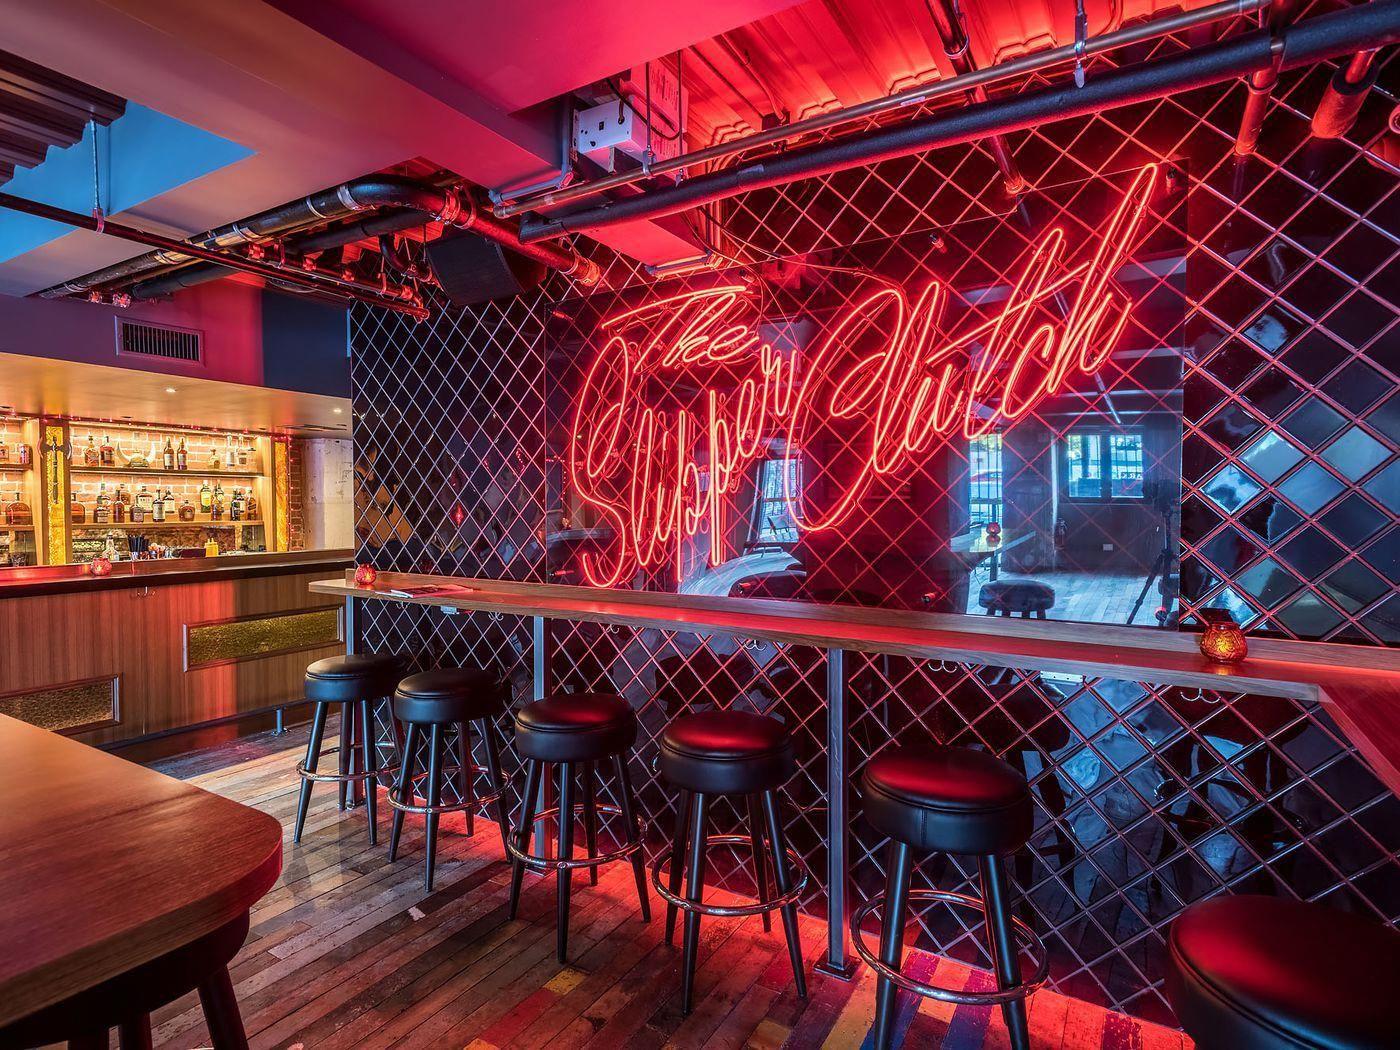 Downtown S Secretive 80s Bar Is The Perfect Throwback Hang Divingplatformtips Bar Interior Design Cocktail Bar Design Bar Design Restaurant